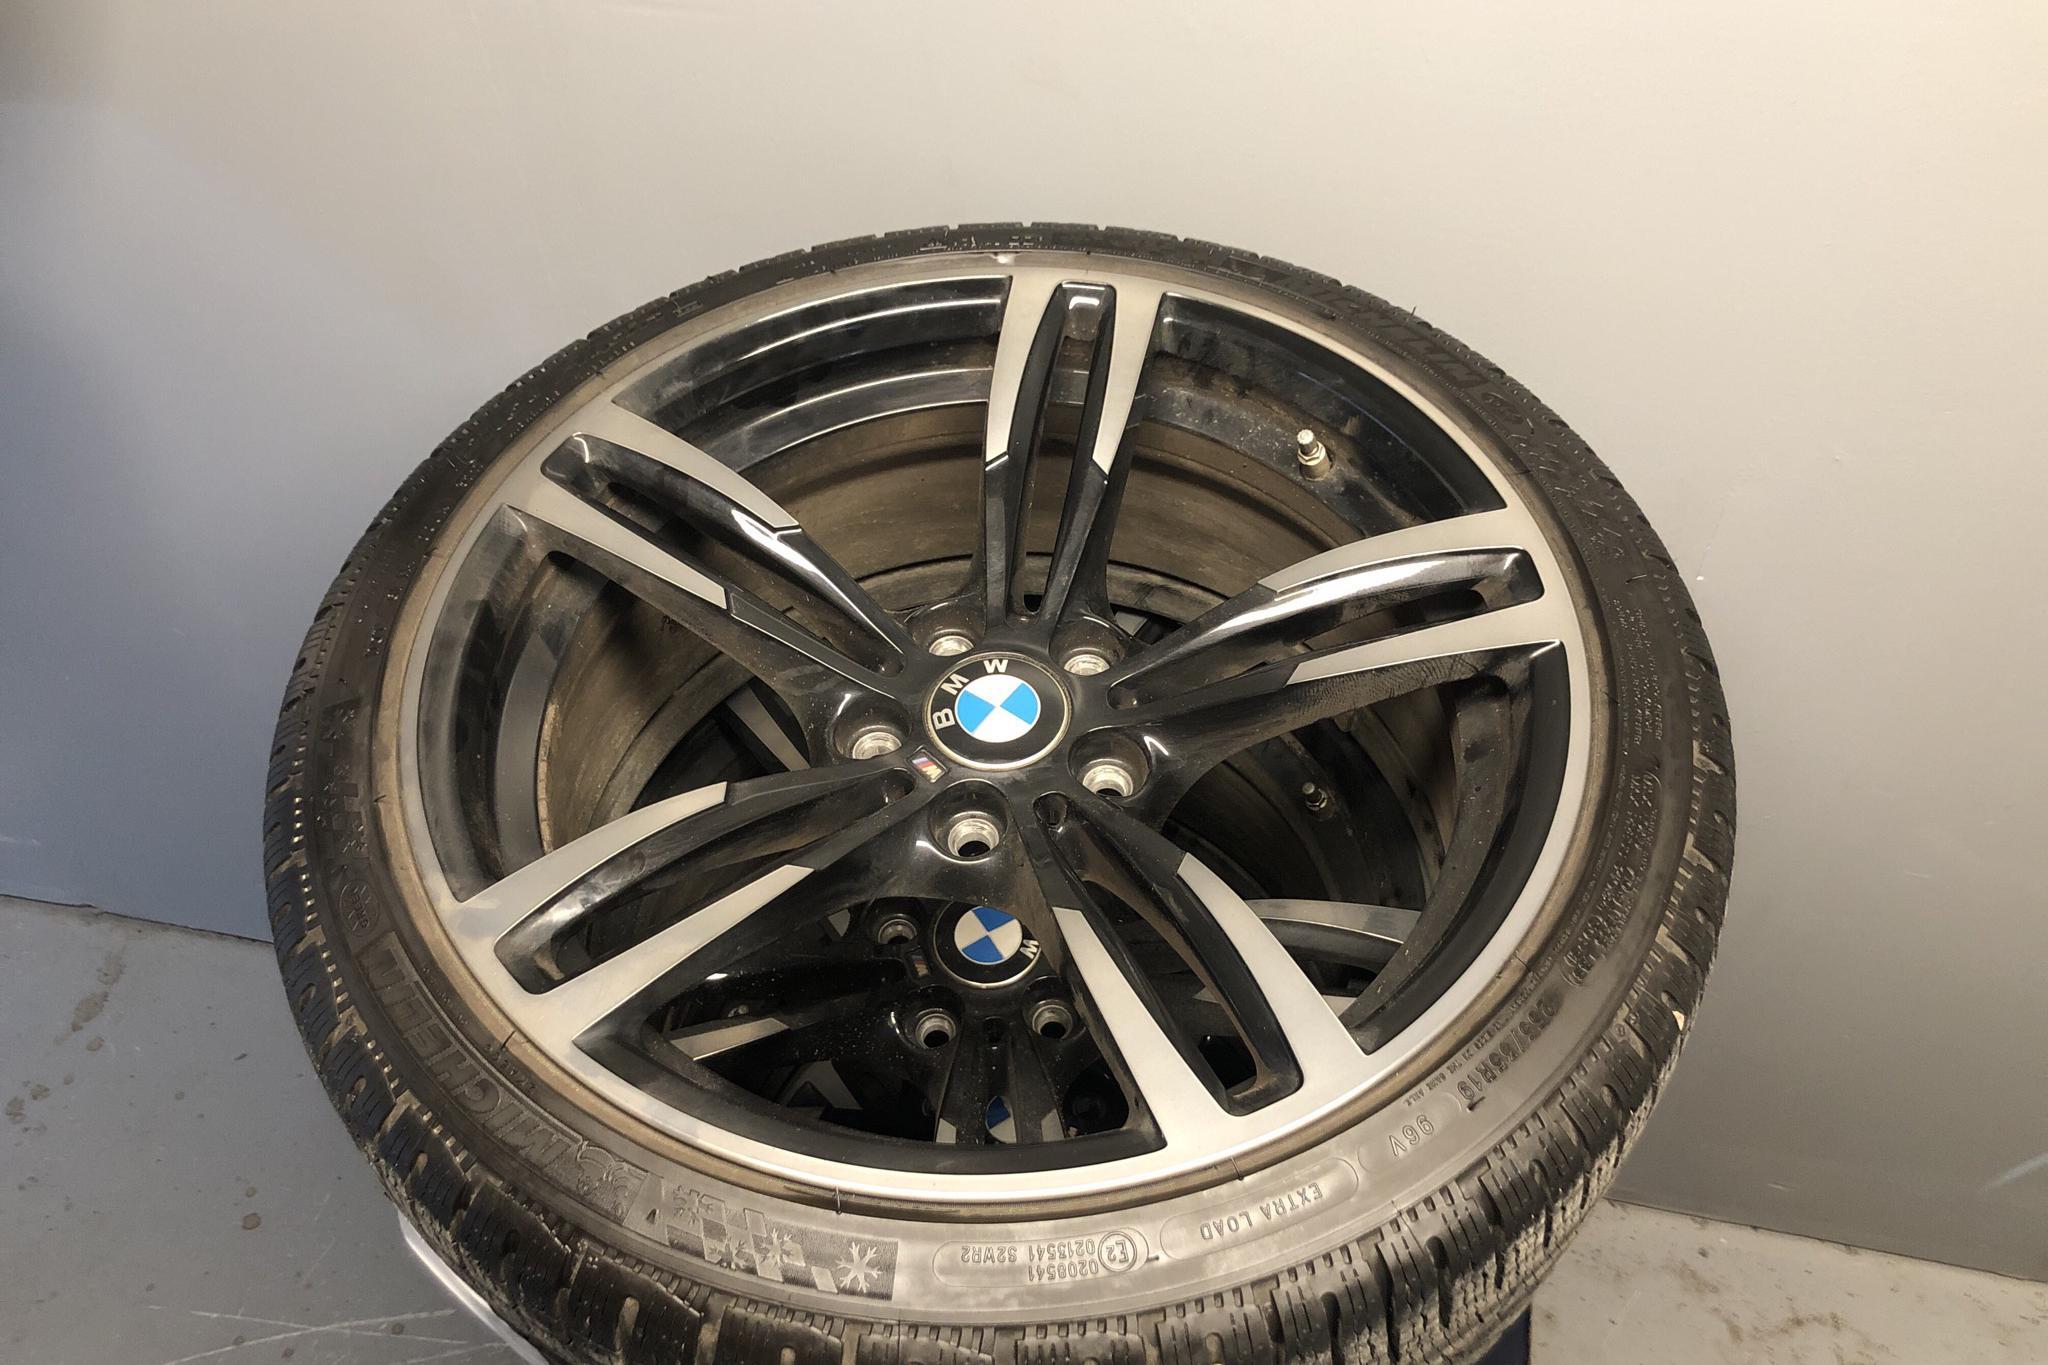 BMW M3 Sedan, F80 (431hk) - 3 977 mil - Manuell - Light Blue - 2016